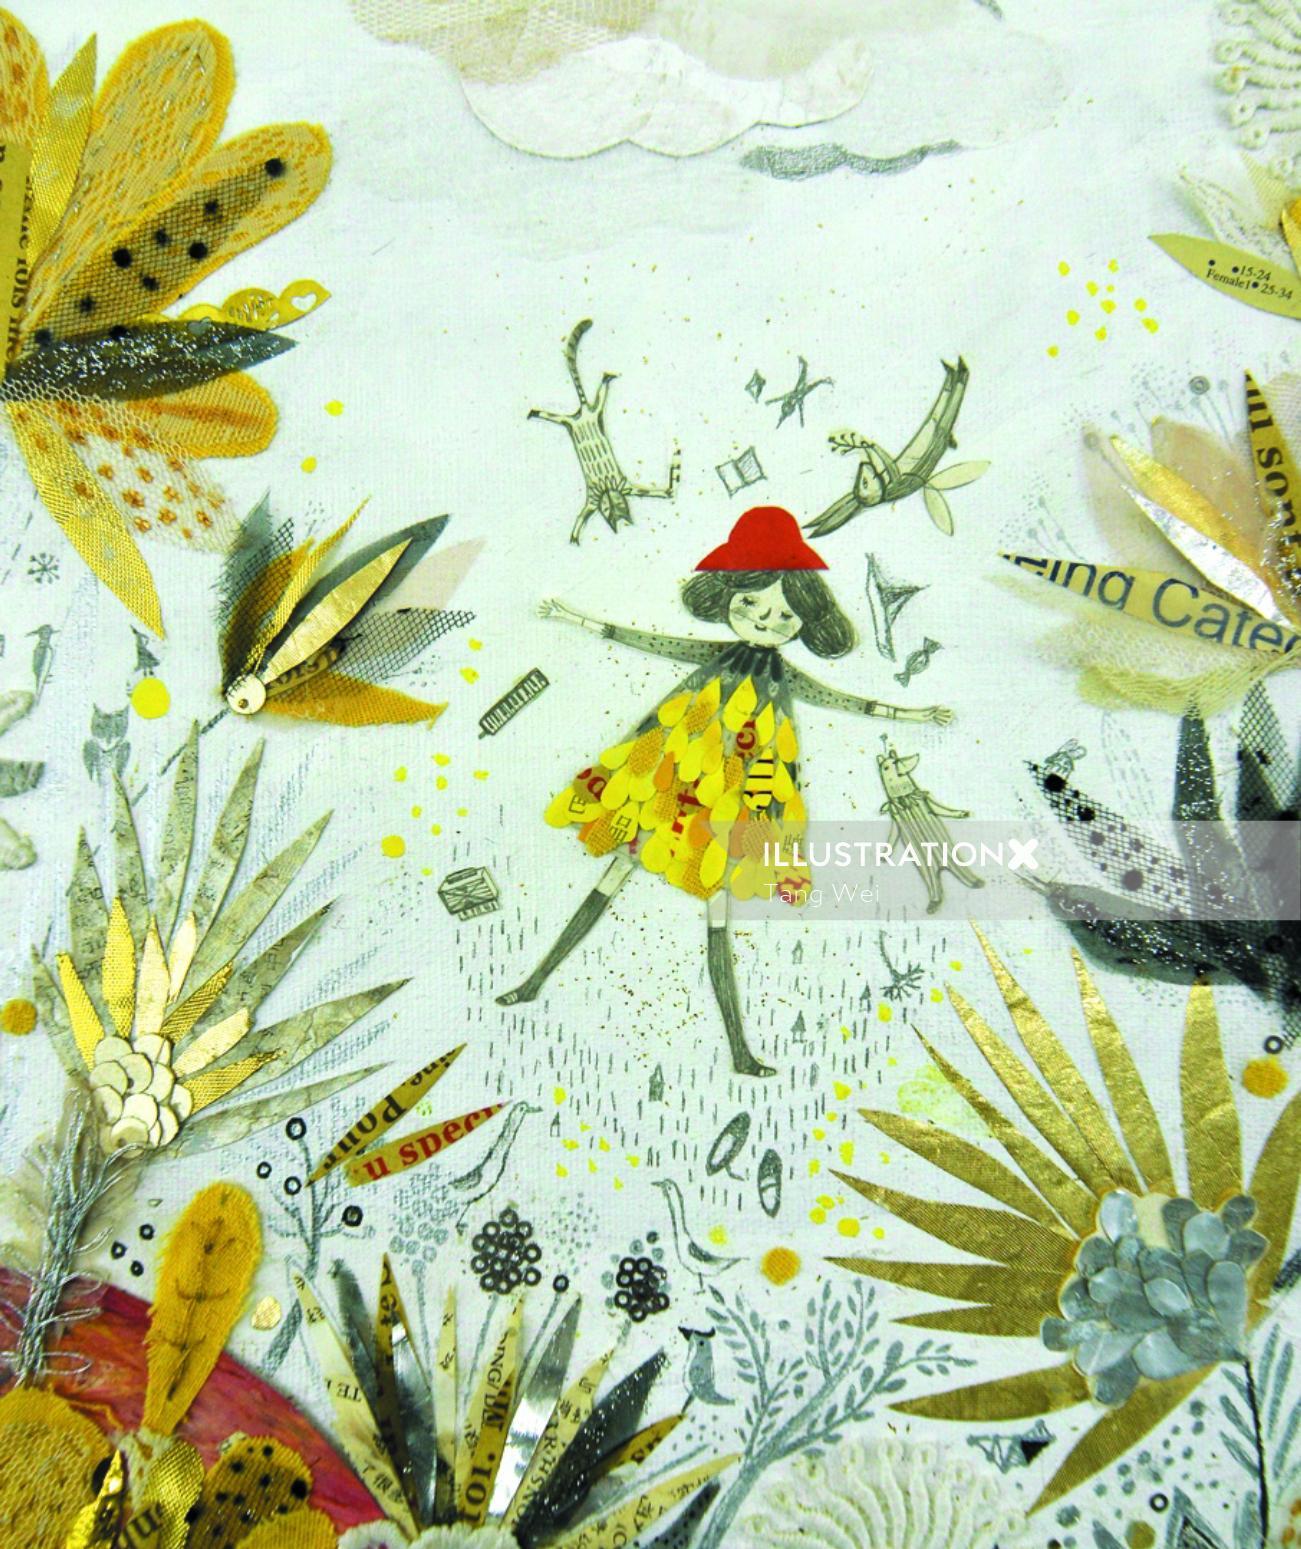 Children's book illustrationo f sleeping on forest